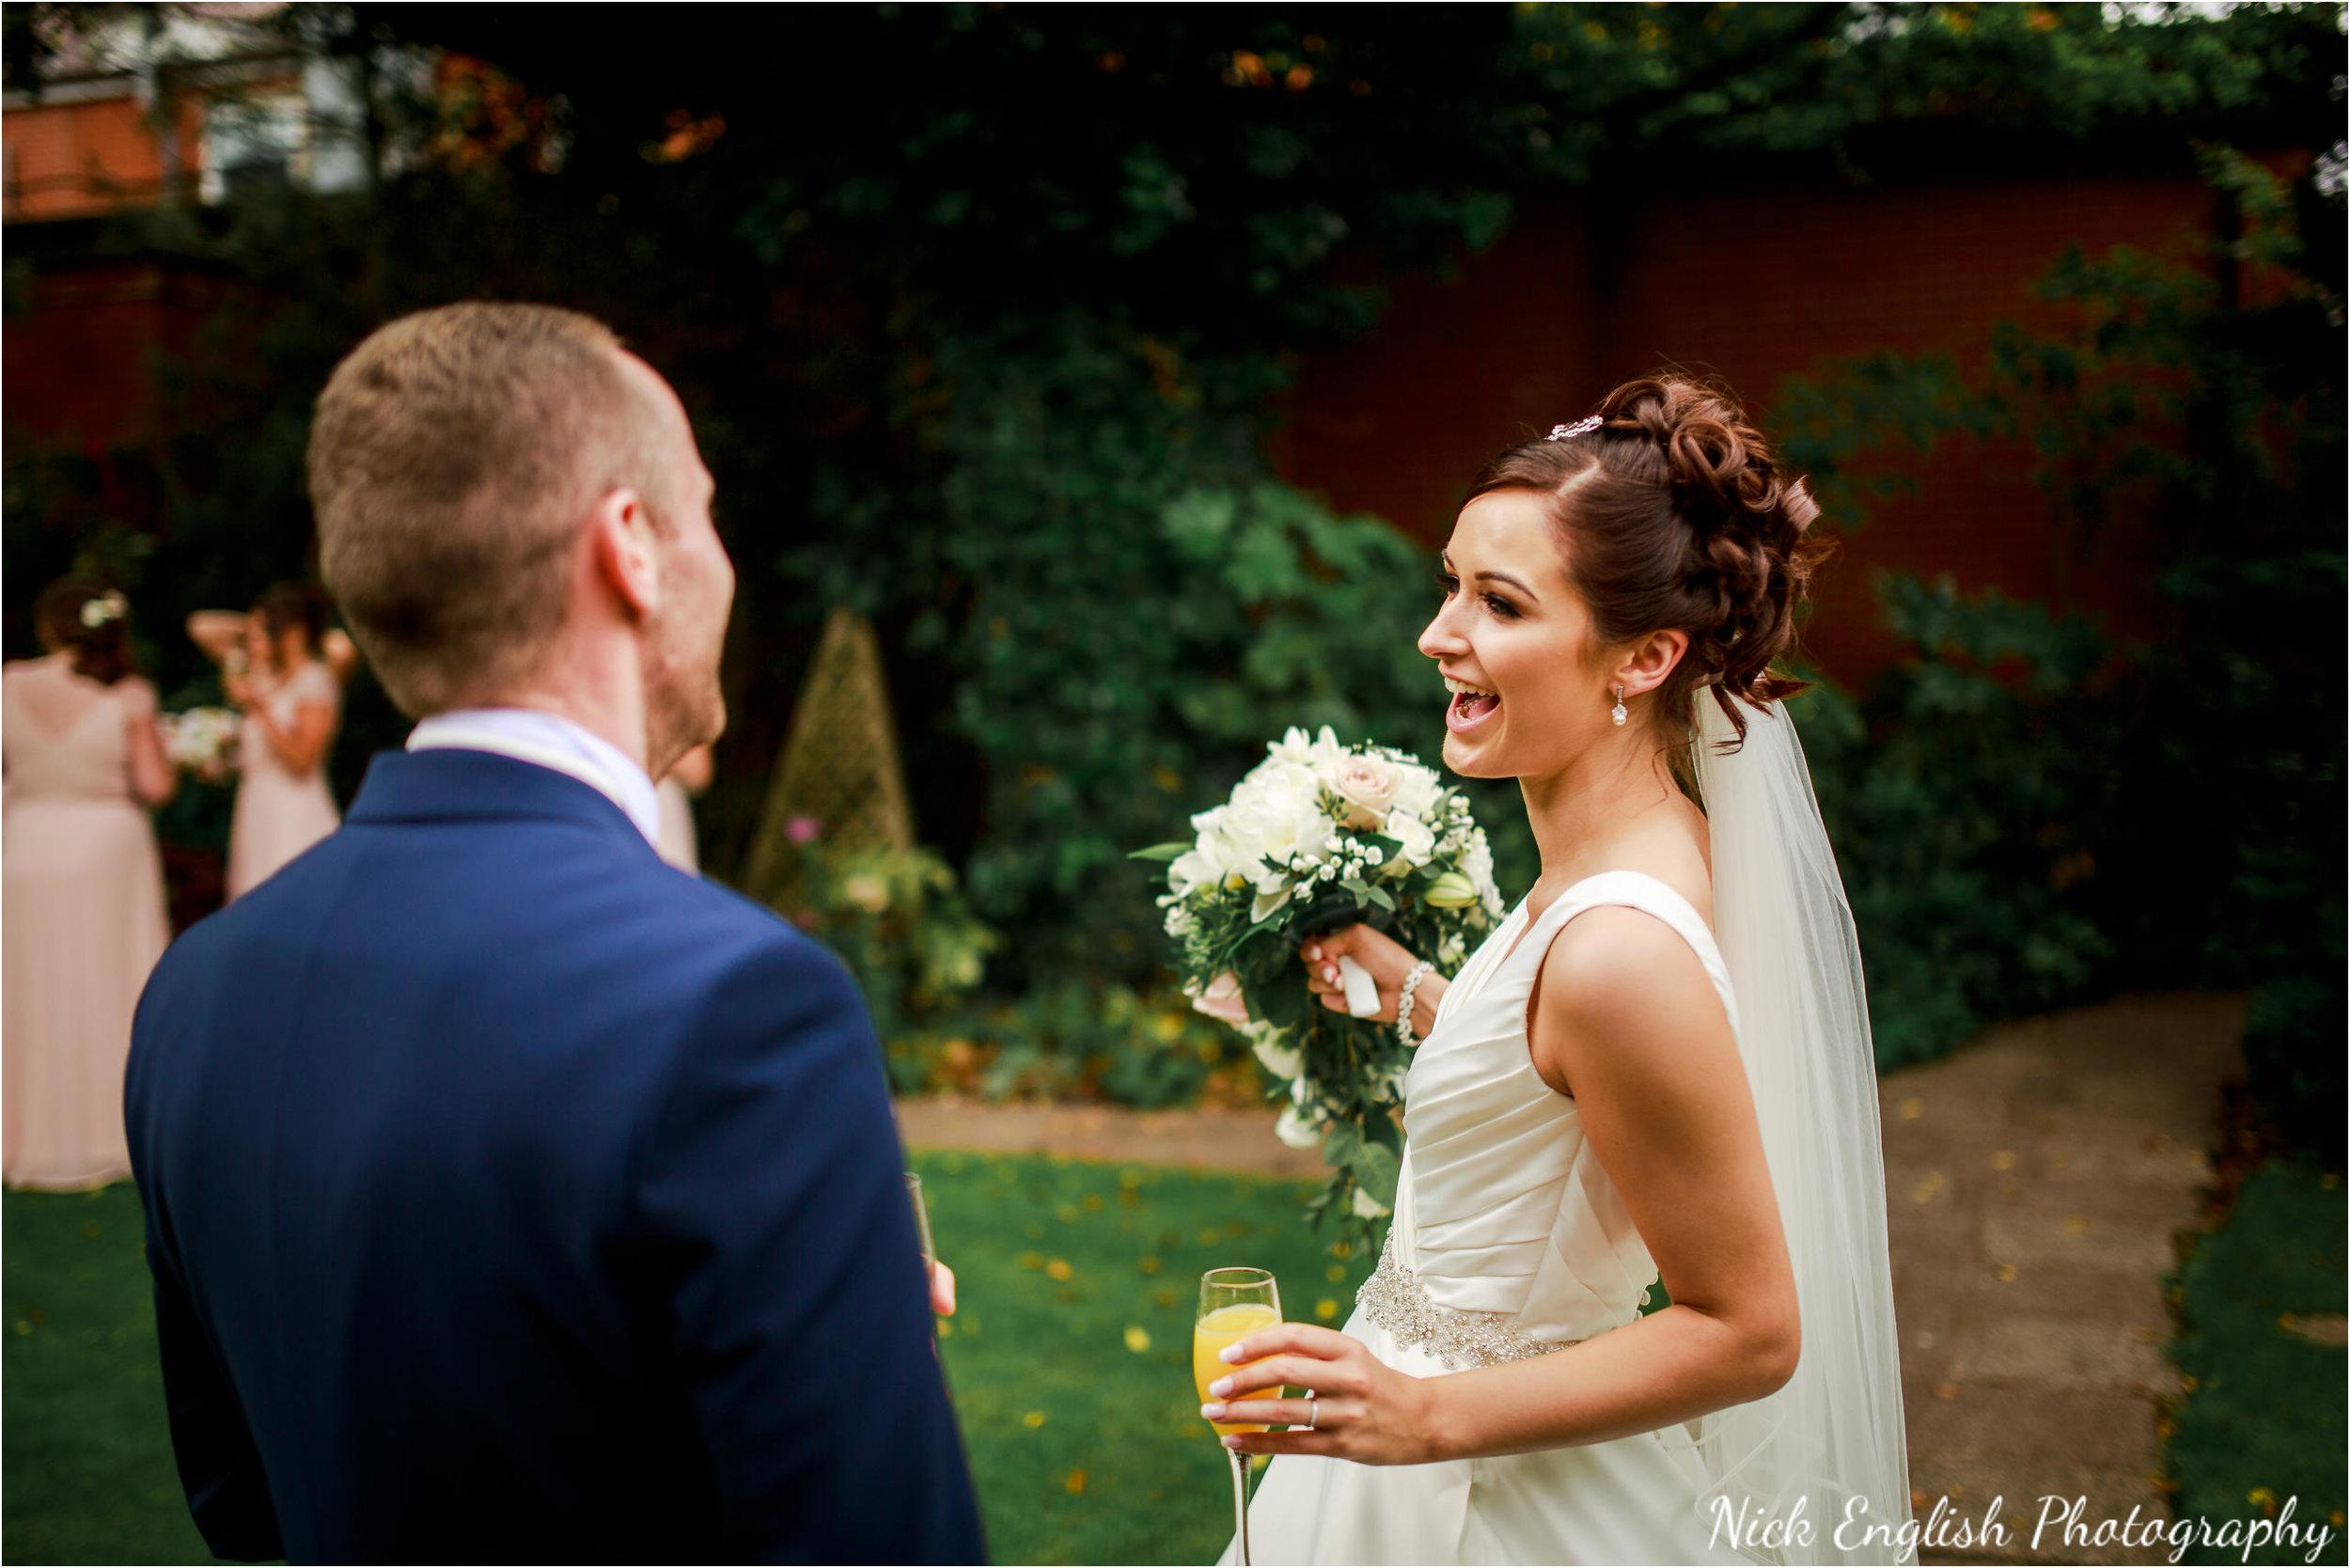 Emily David Wedding Photographs at Barton Grange Preston by Nick English Photography 91jpg.jpeg